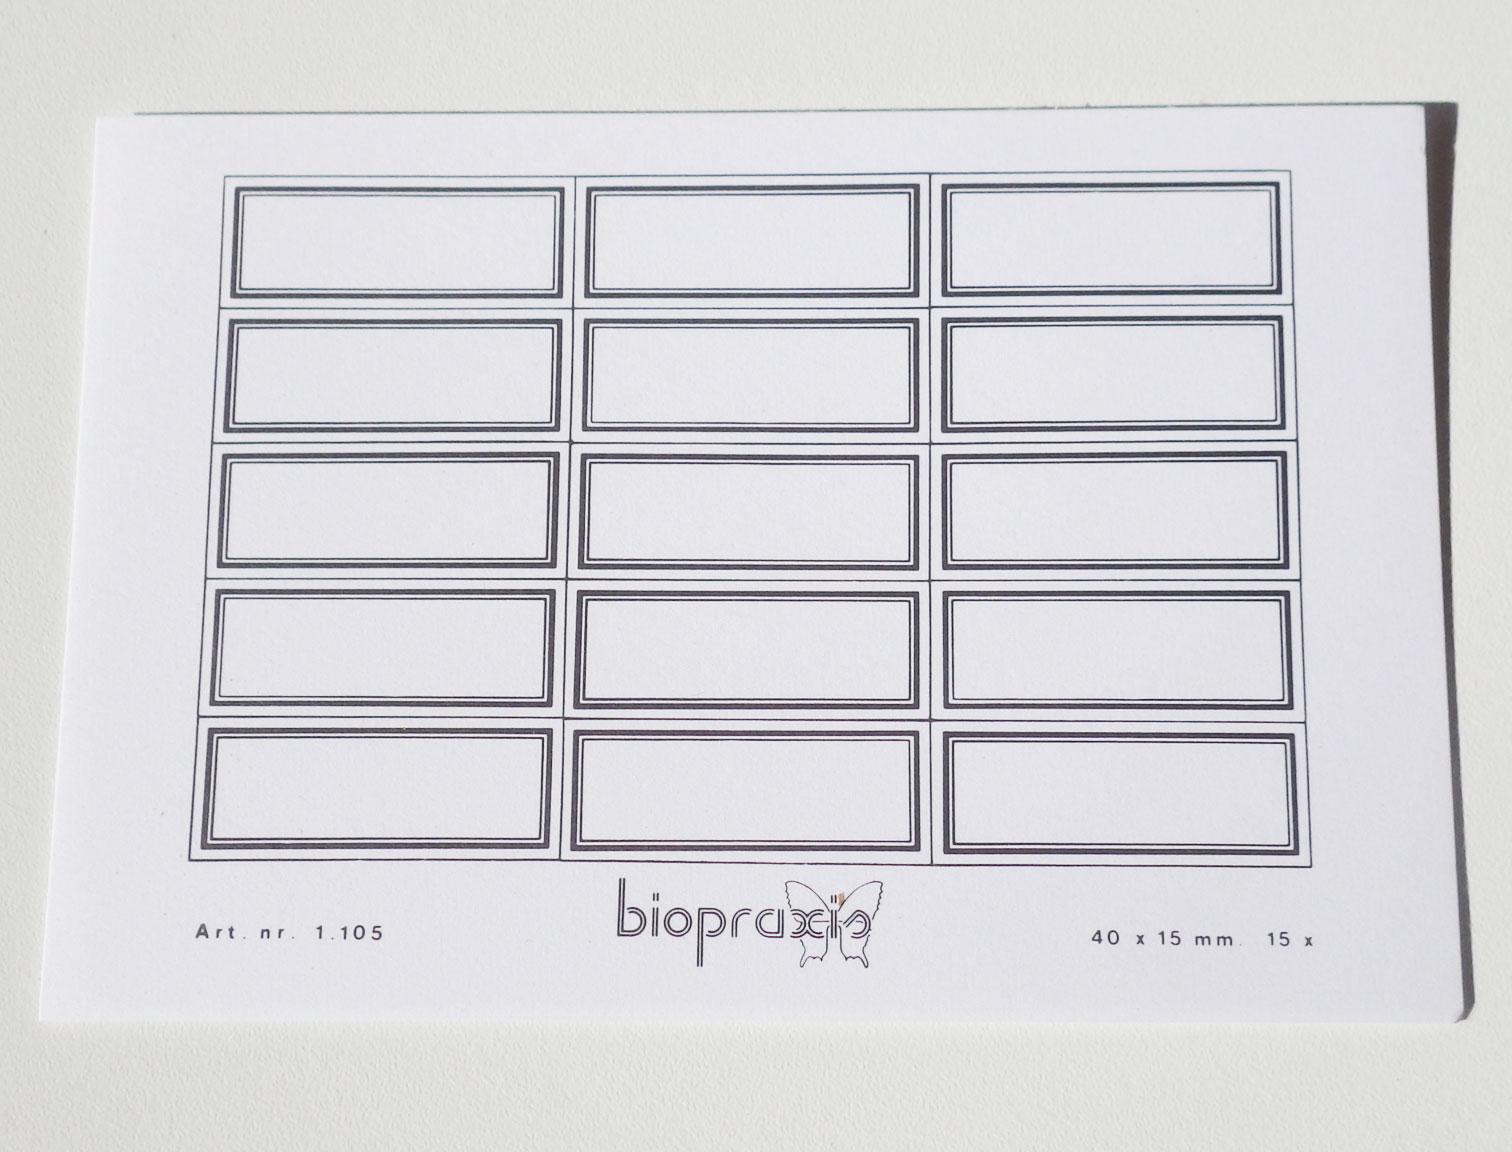 biopraxis-40x15